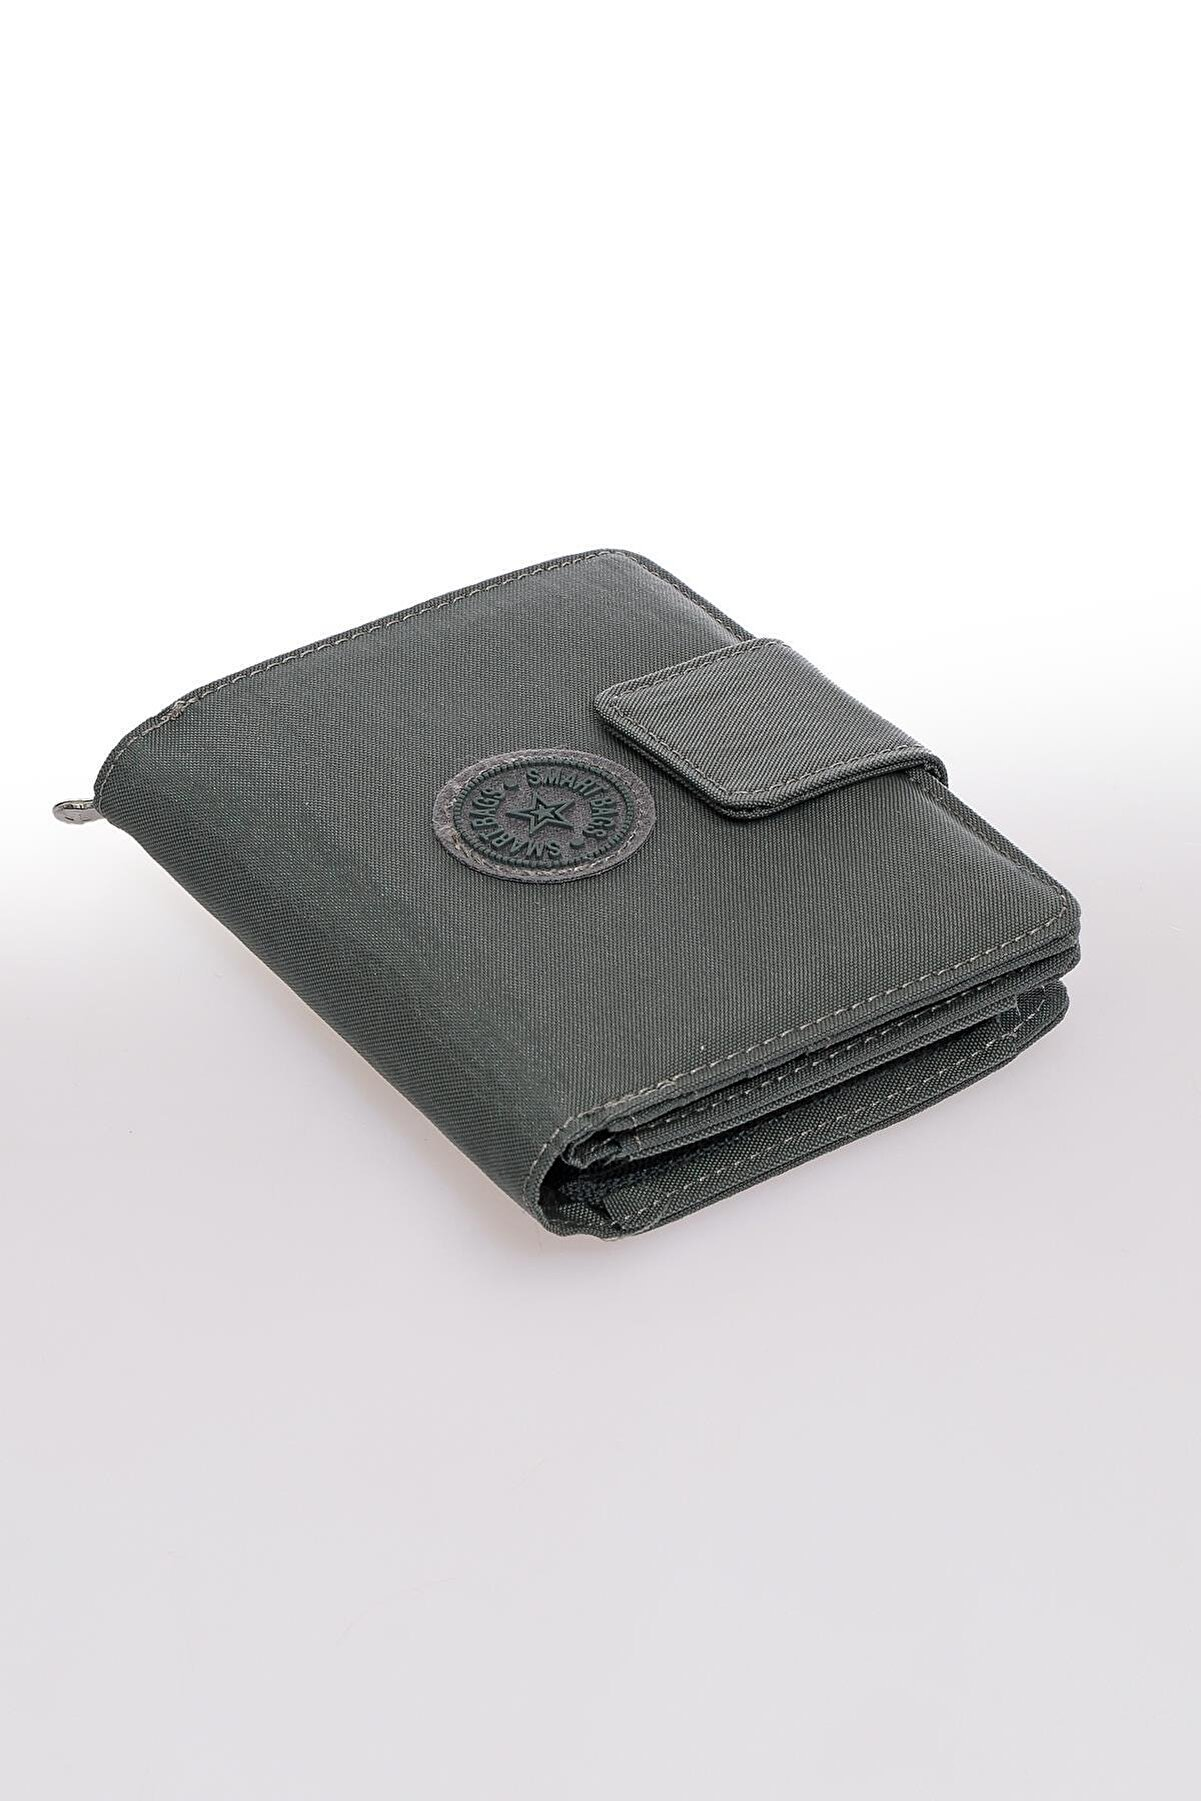 Smart Bags Smb3035-0005 Haki Kadın Cüzdan